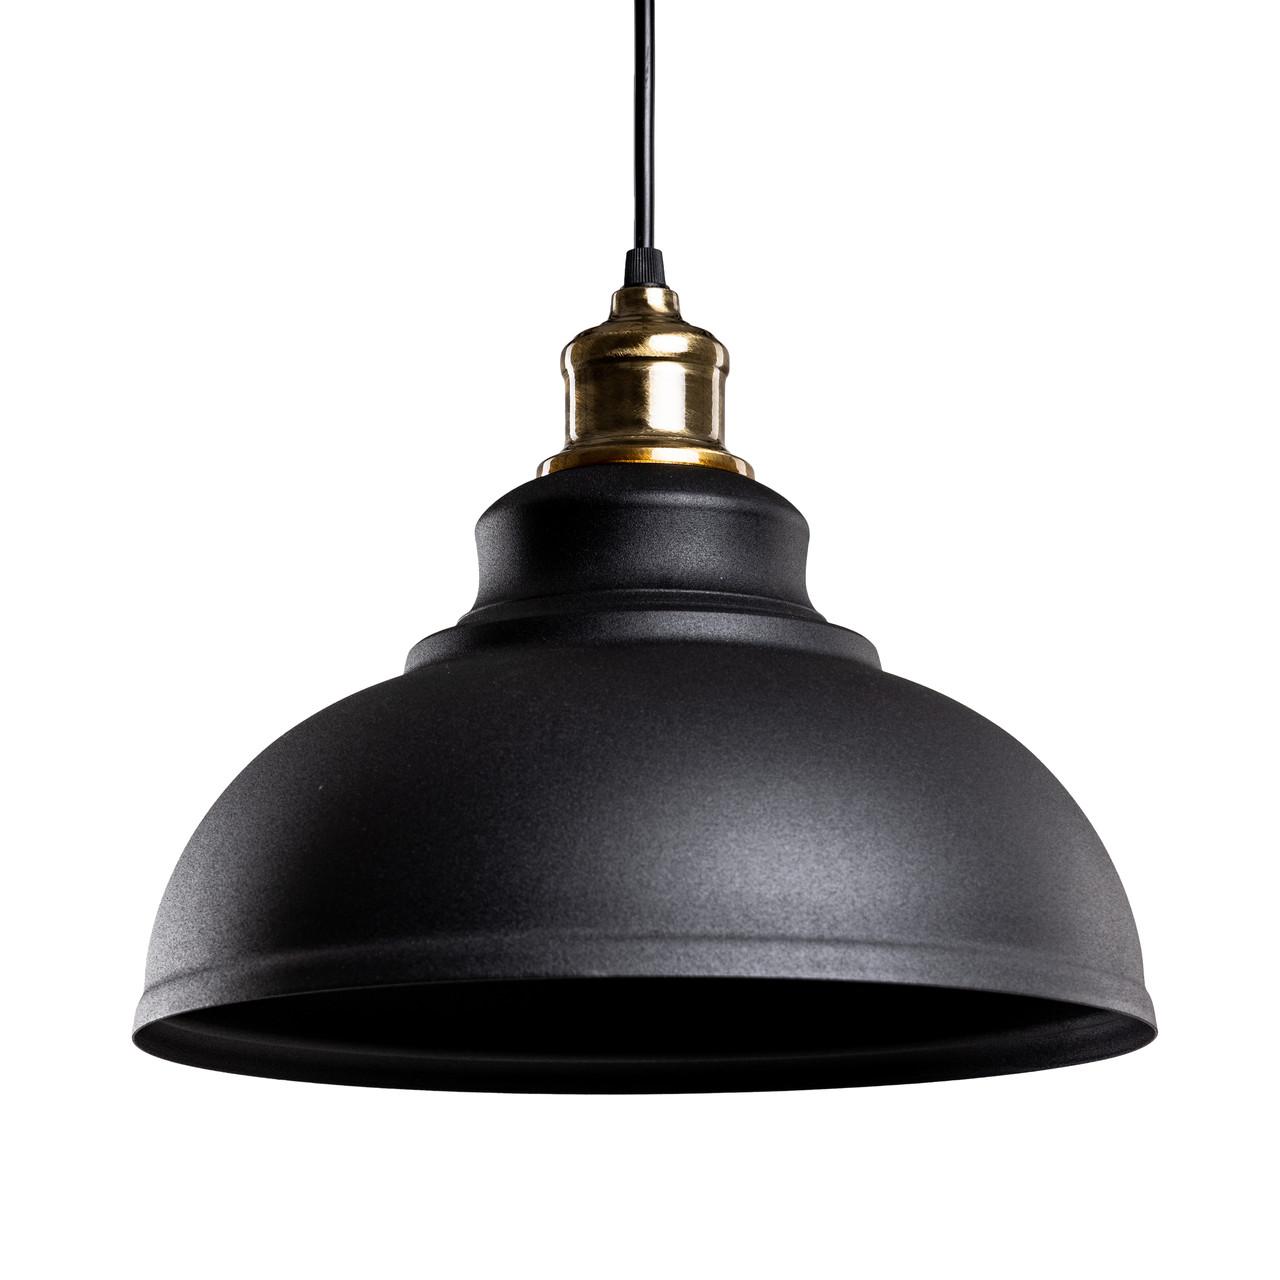 Люстра підвісна Atma Light серії Denver P290 Black